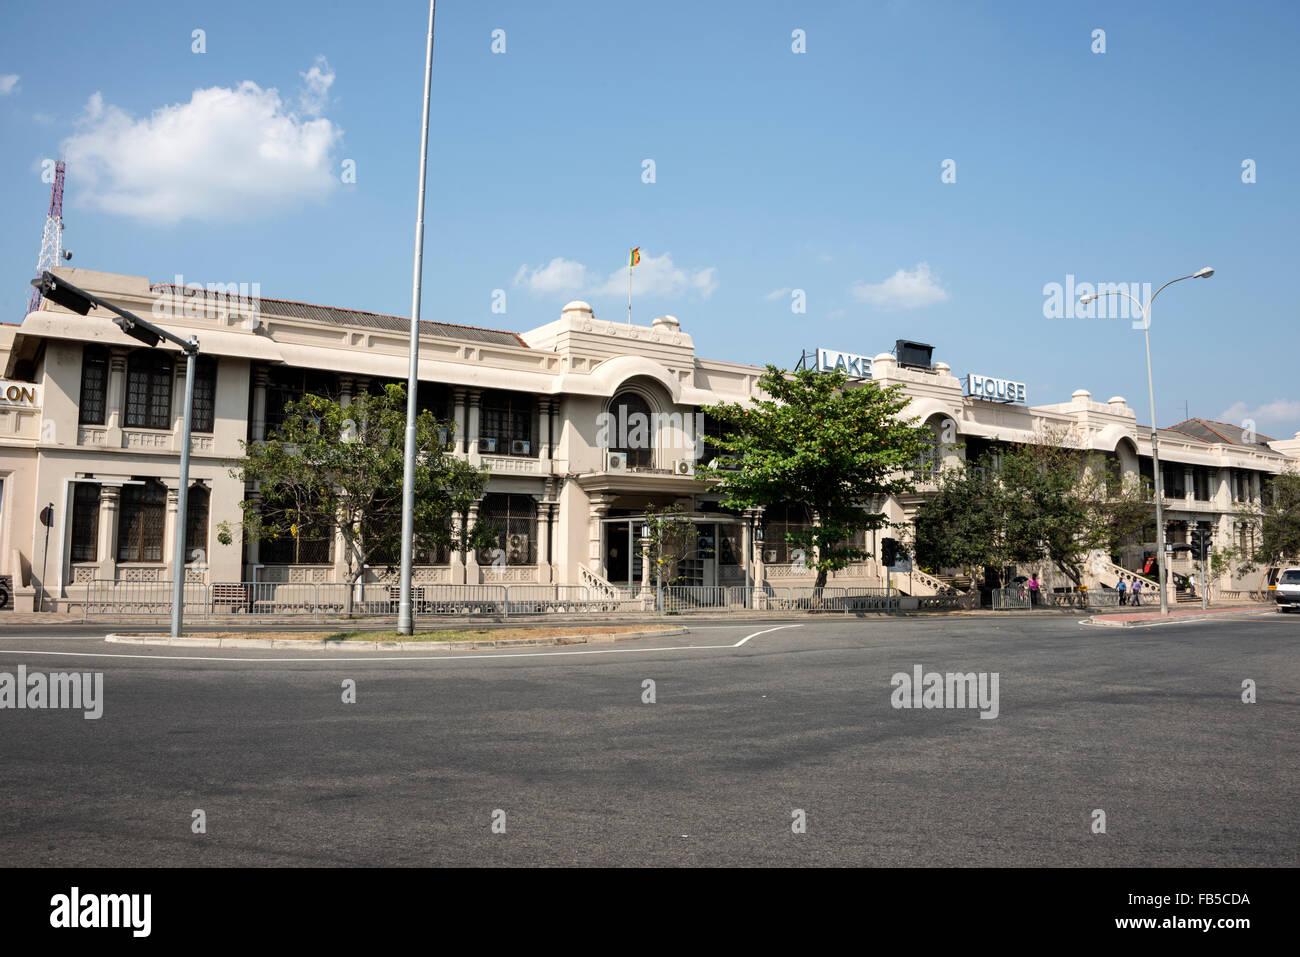 Associated Newspapers of Ceylon Ltd  based at  Lake House on D. R. Wijewardena Mawatha, Colombo, Sri Lanka. - Stock Image